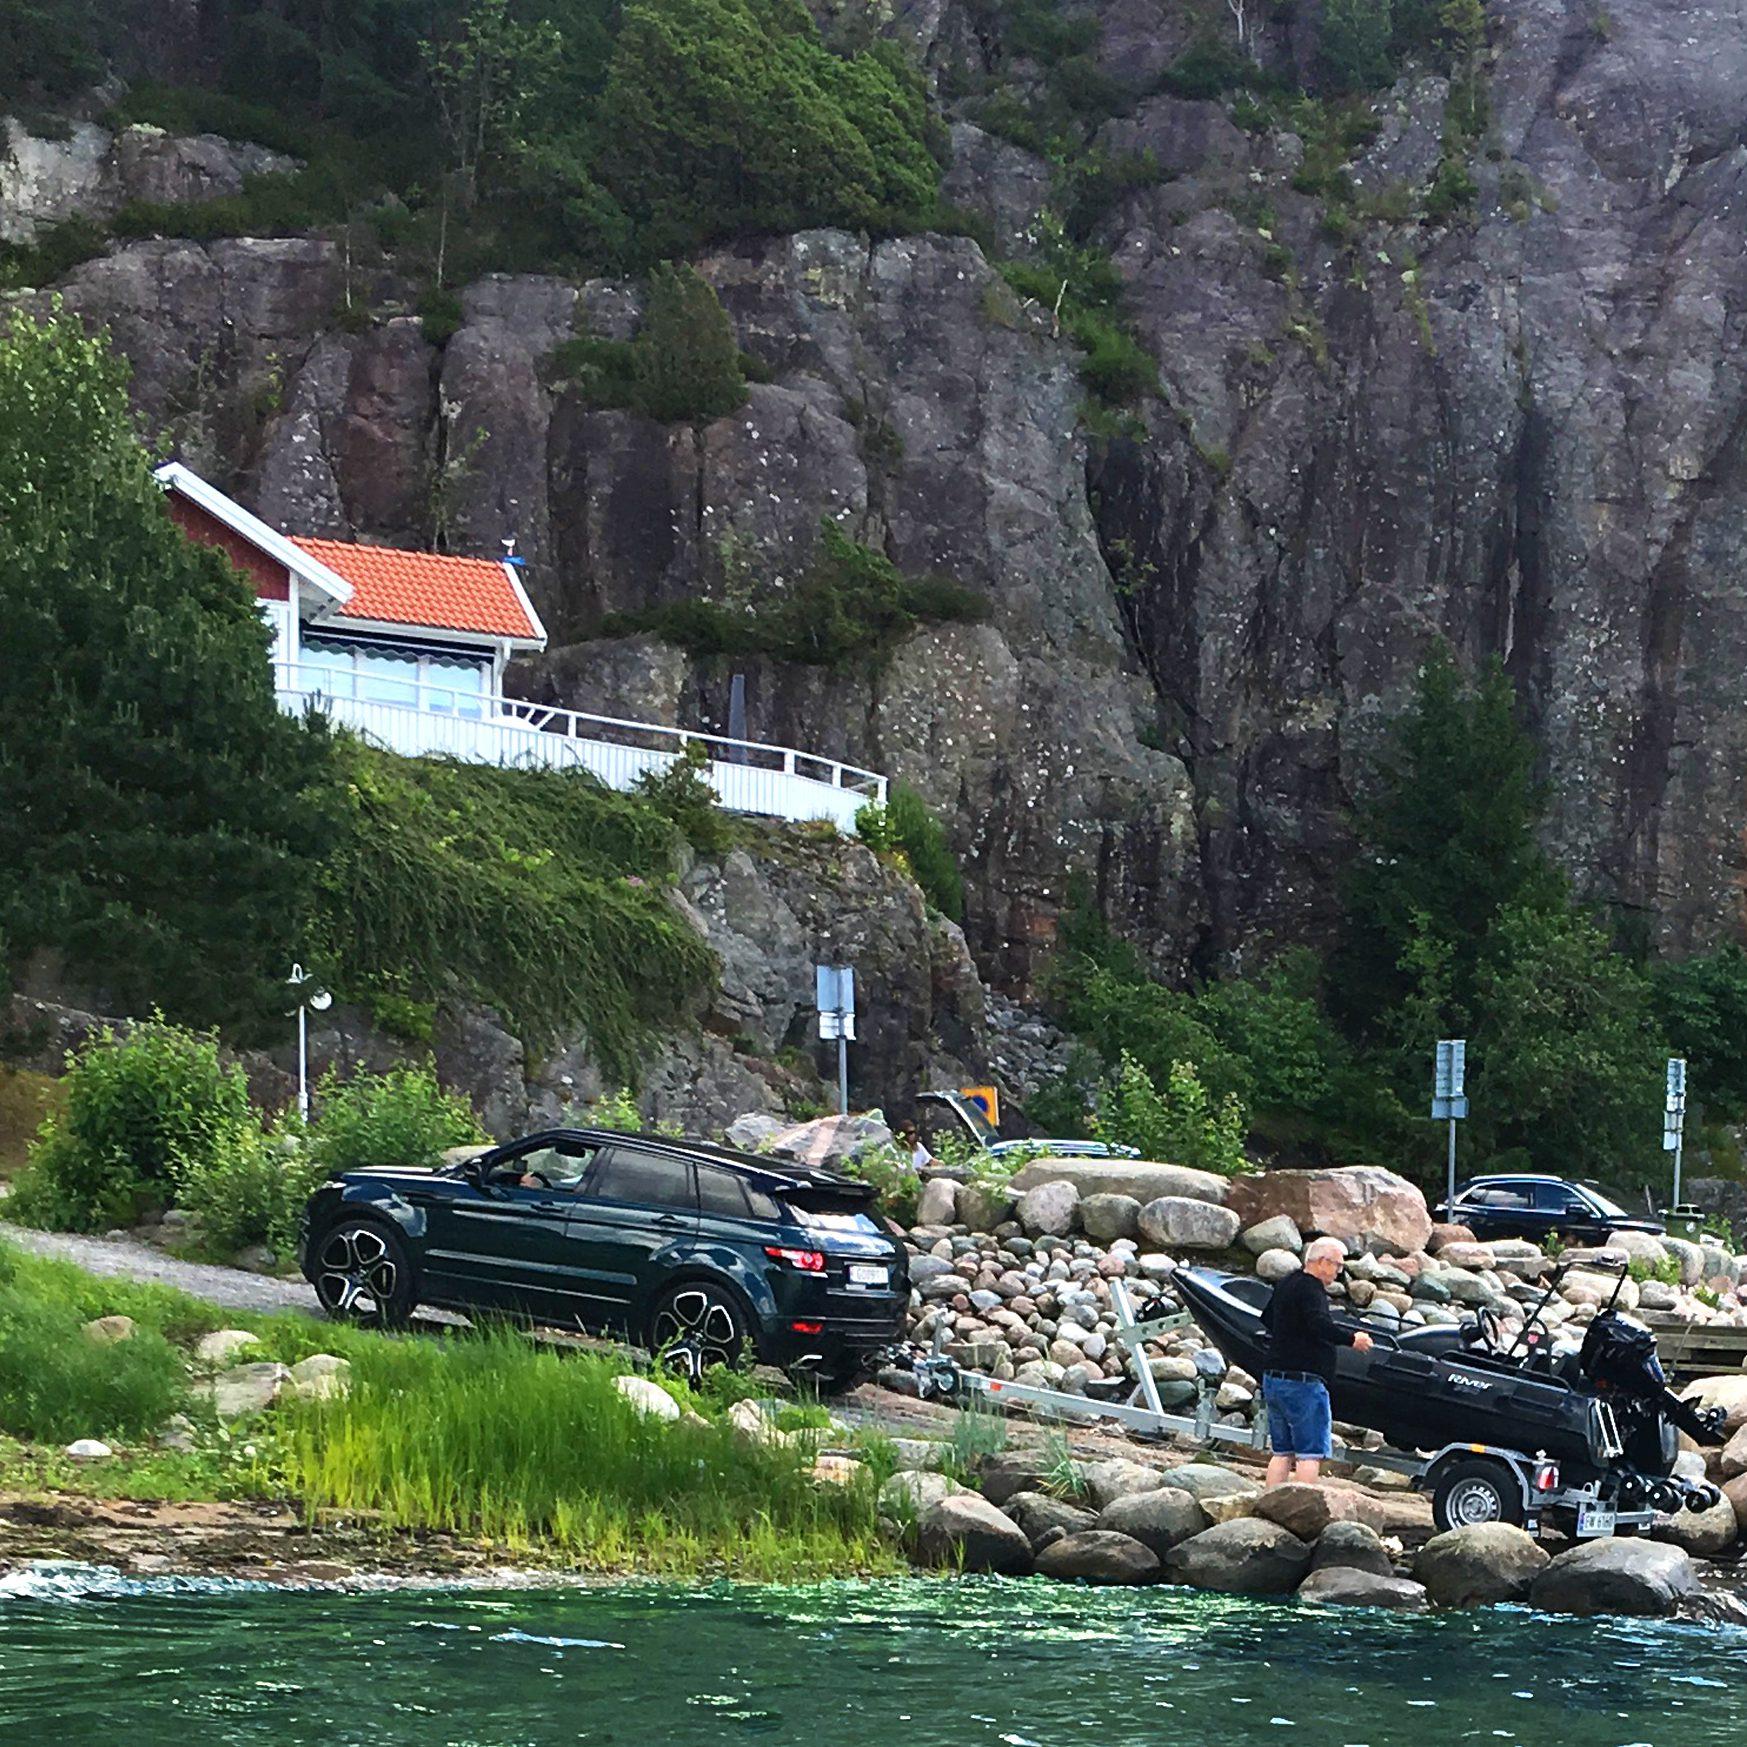 motorboot kaufen, boot, angelboot, fischerboot, münchen, hamburg